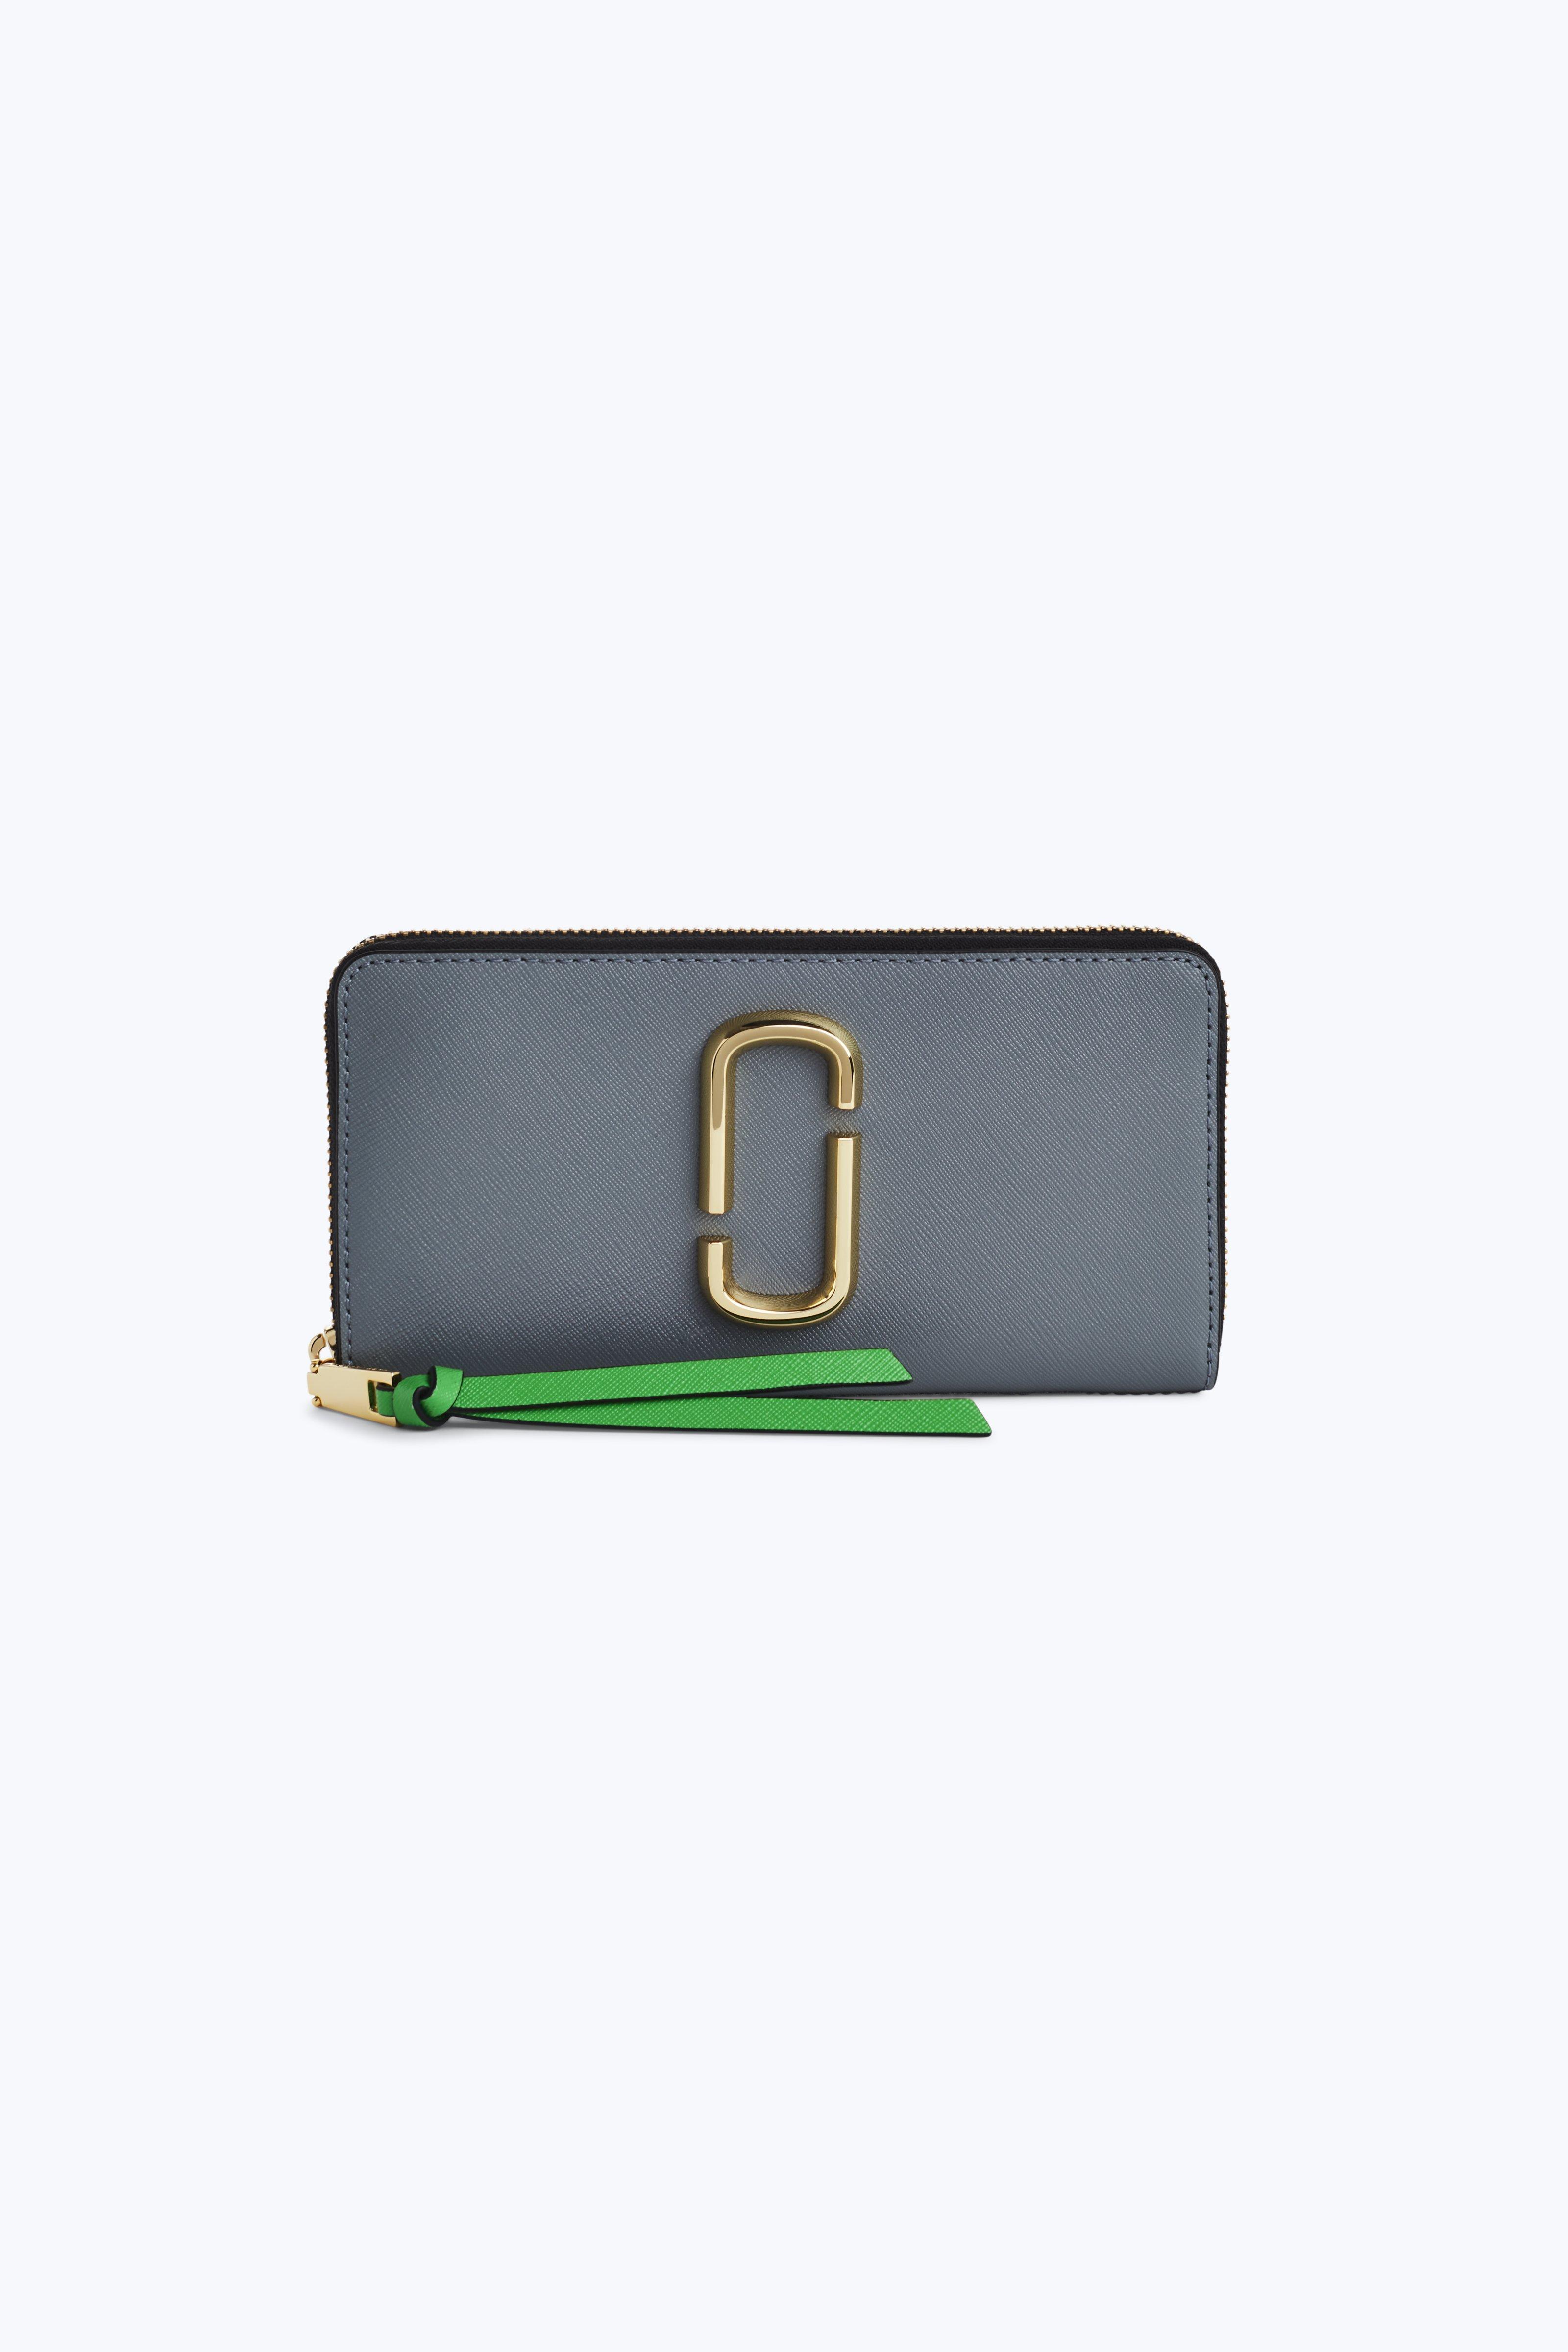 Black Snapshot Standard Continental Wallet Marc Jacobs 6VgaZcmZQ